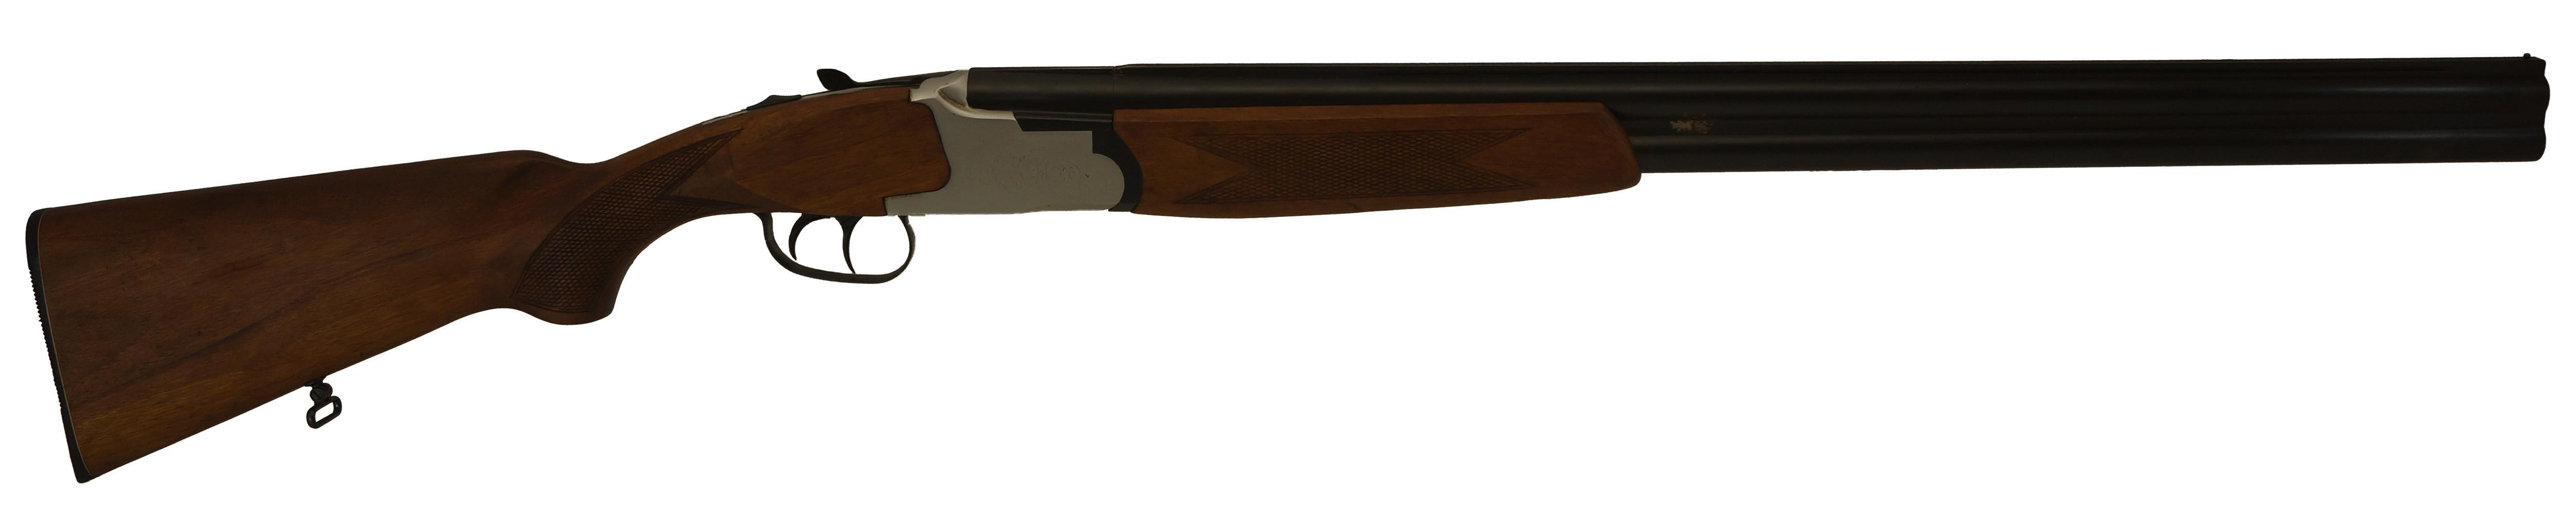 "Zastava M80, 12GA, 28"" Barrel, *Very Good, Incomplete*"